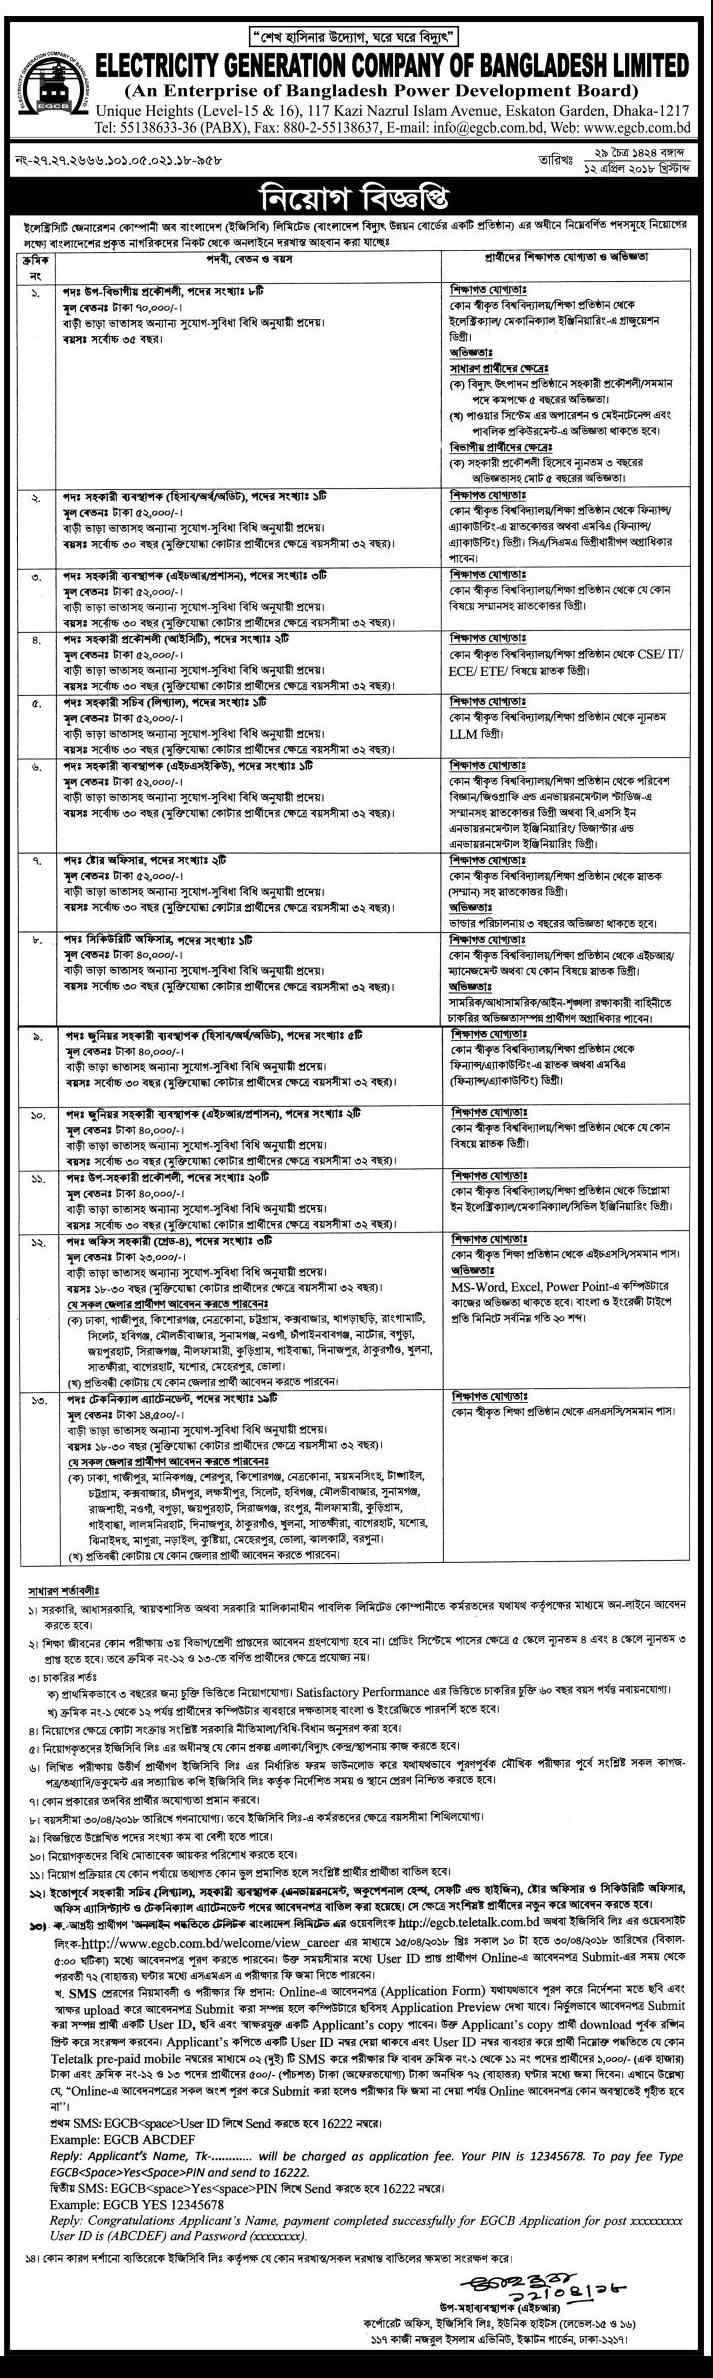 Electricity Generation Company of Bangladesh EGCB Job Circular 2018